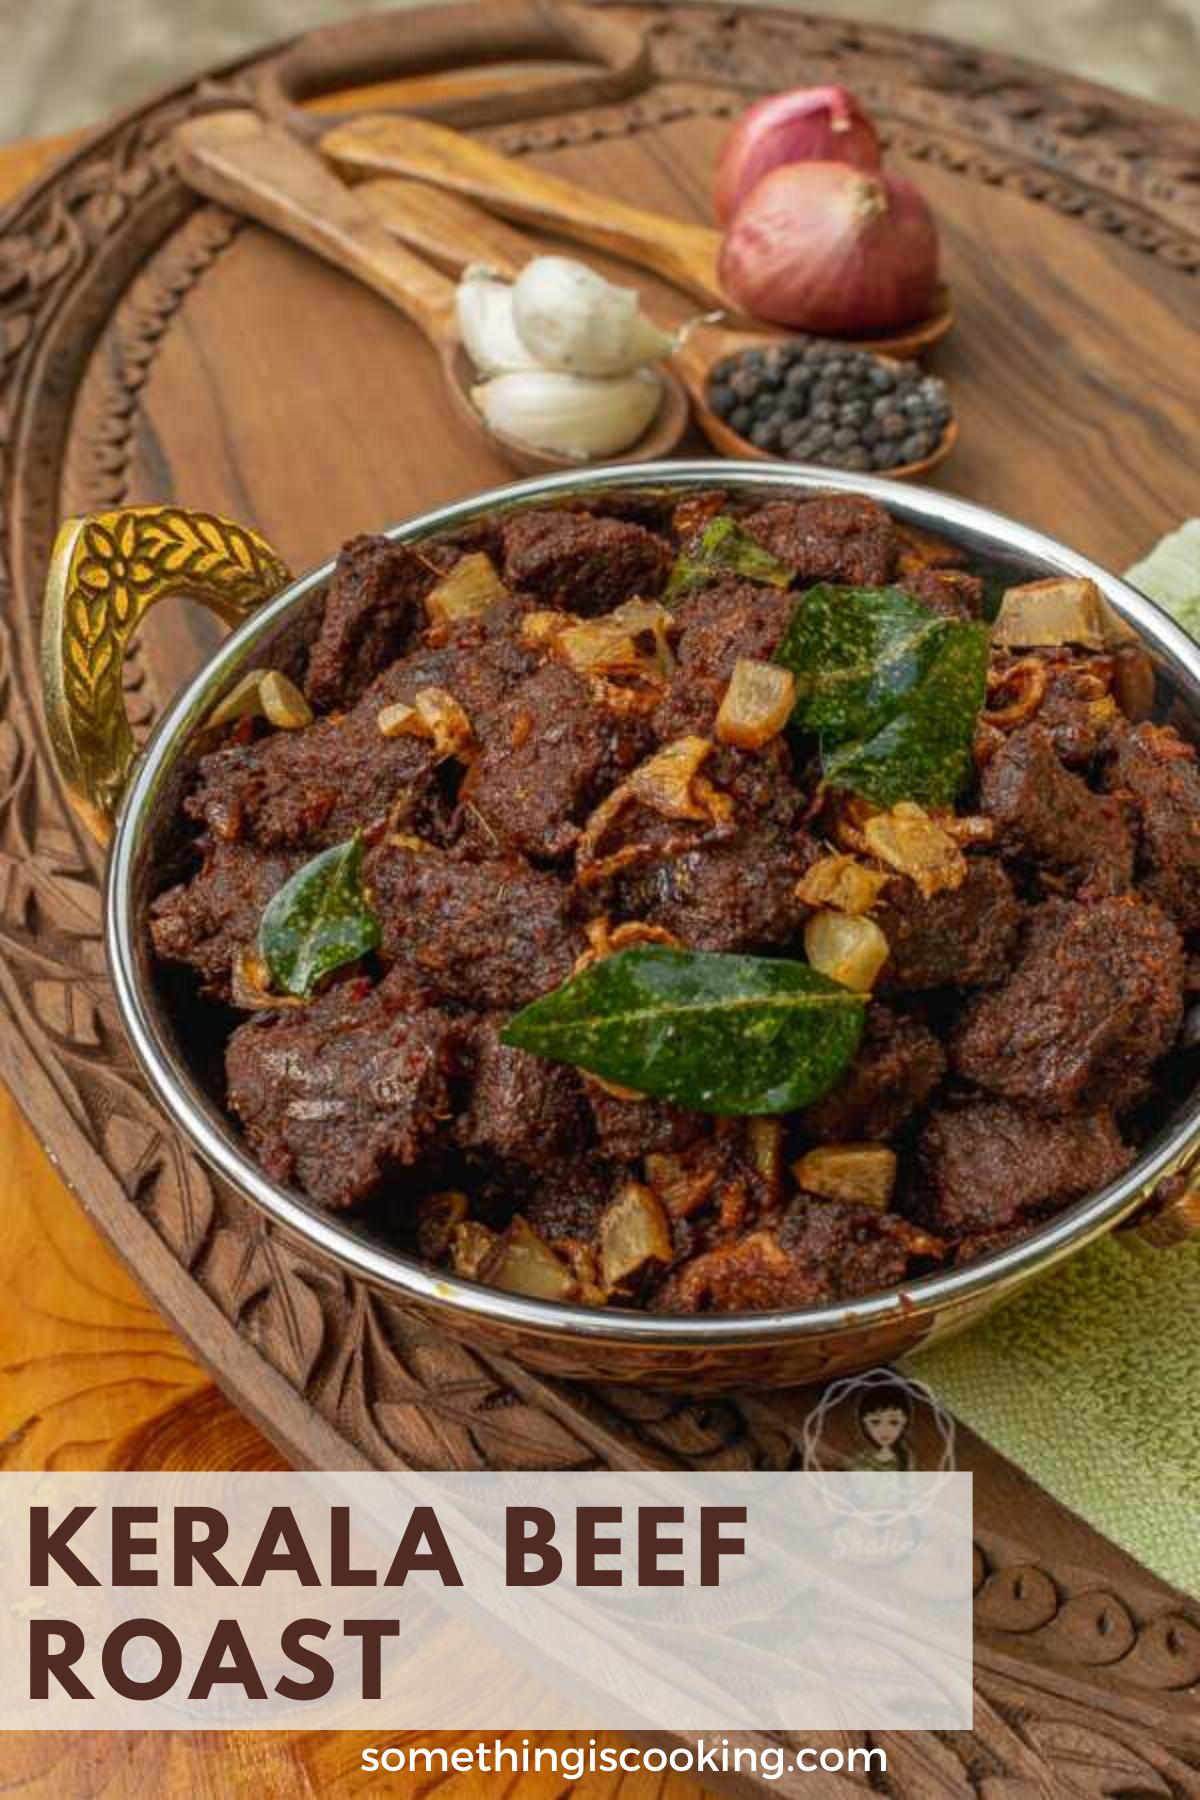 Kottayam Style Beef Ularthiyathu Beef Roast Atozchallenge Recipe In 2020 Beef Roast Beef Recipes Indian Food Recipes